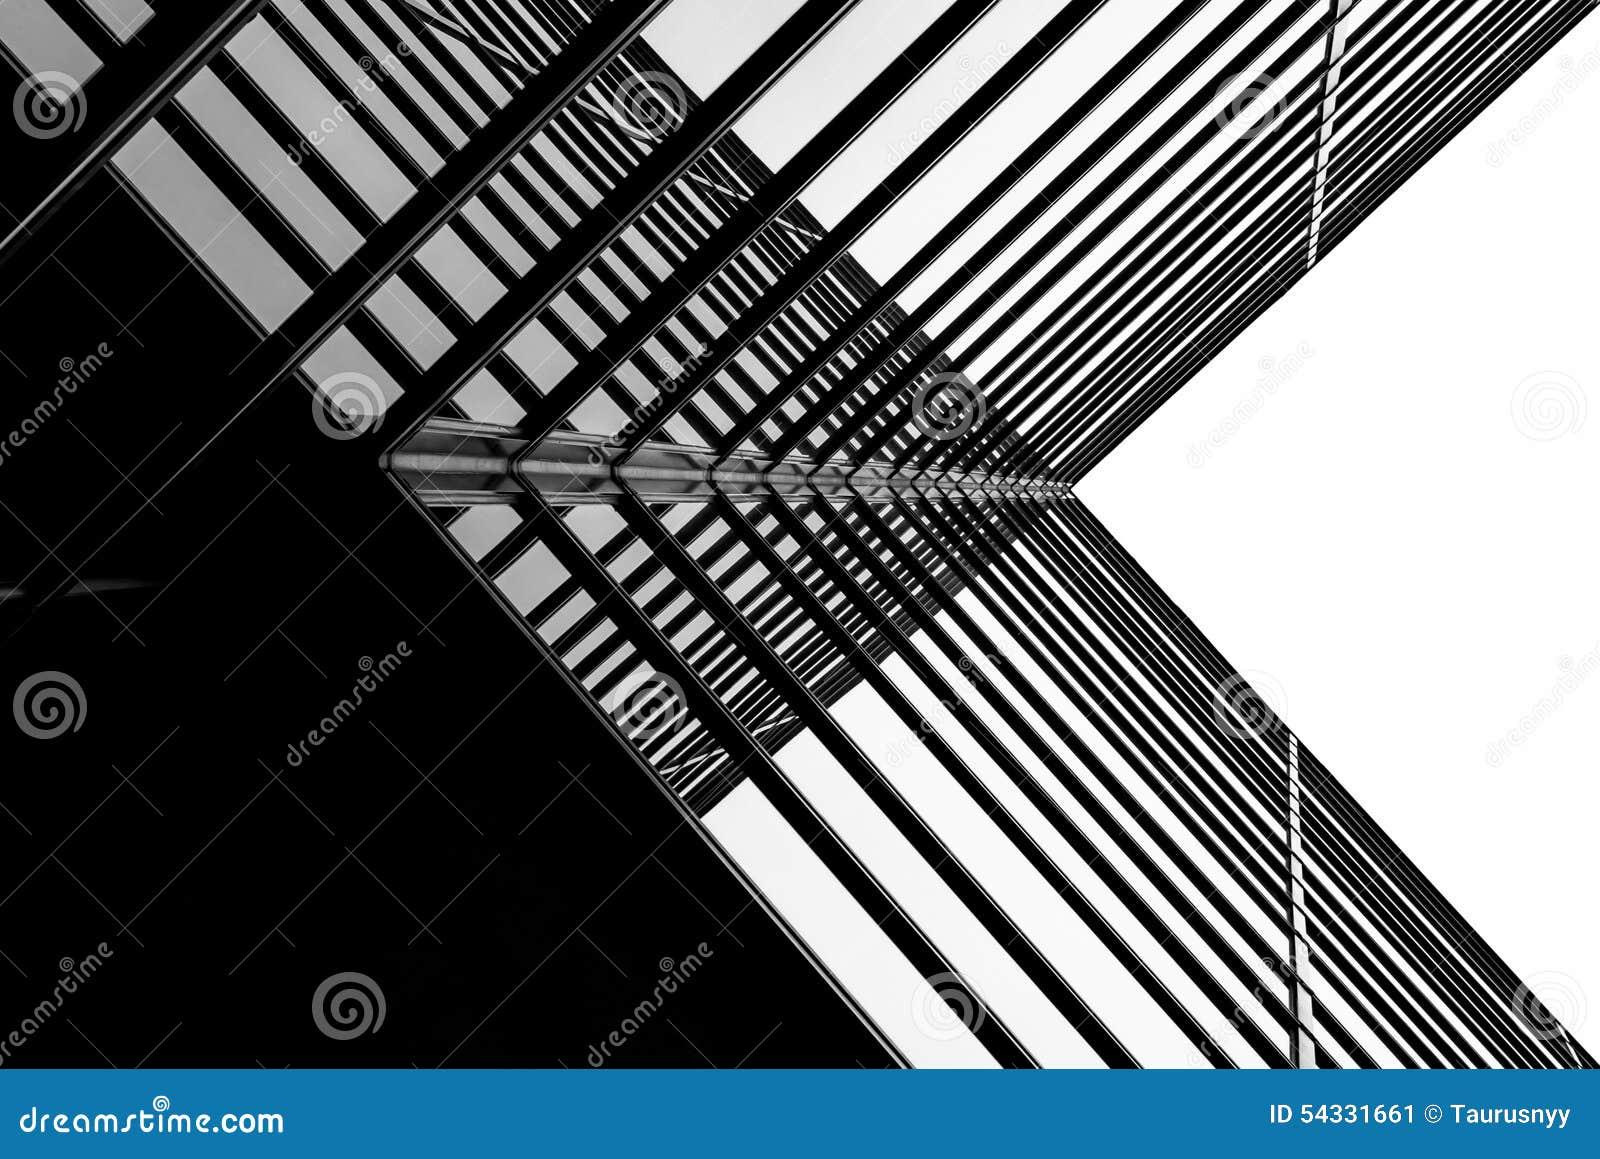 Arquitetura moderna X